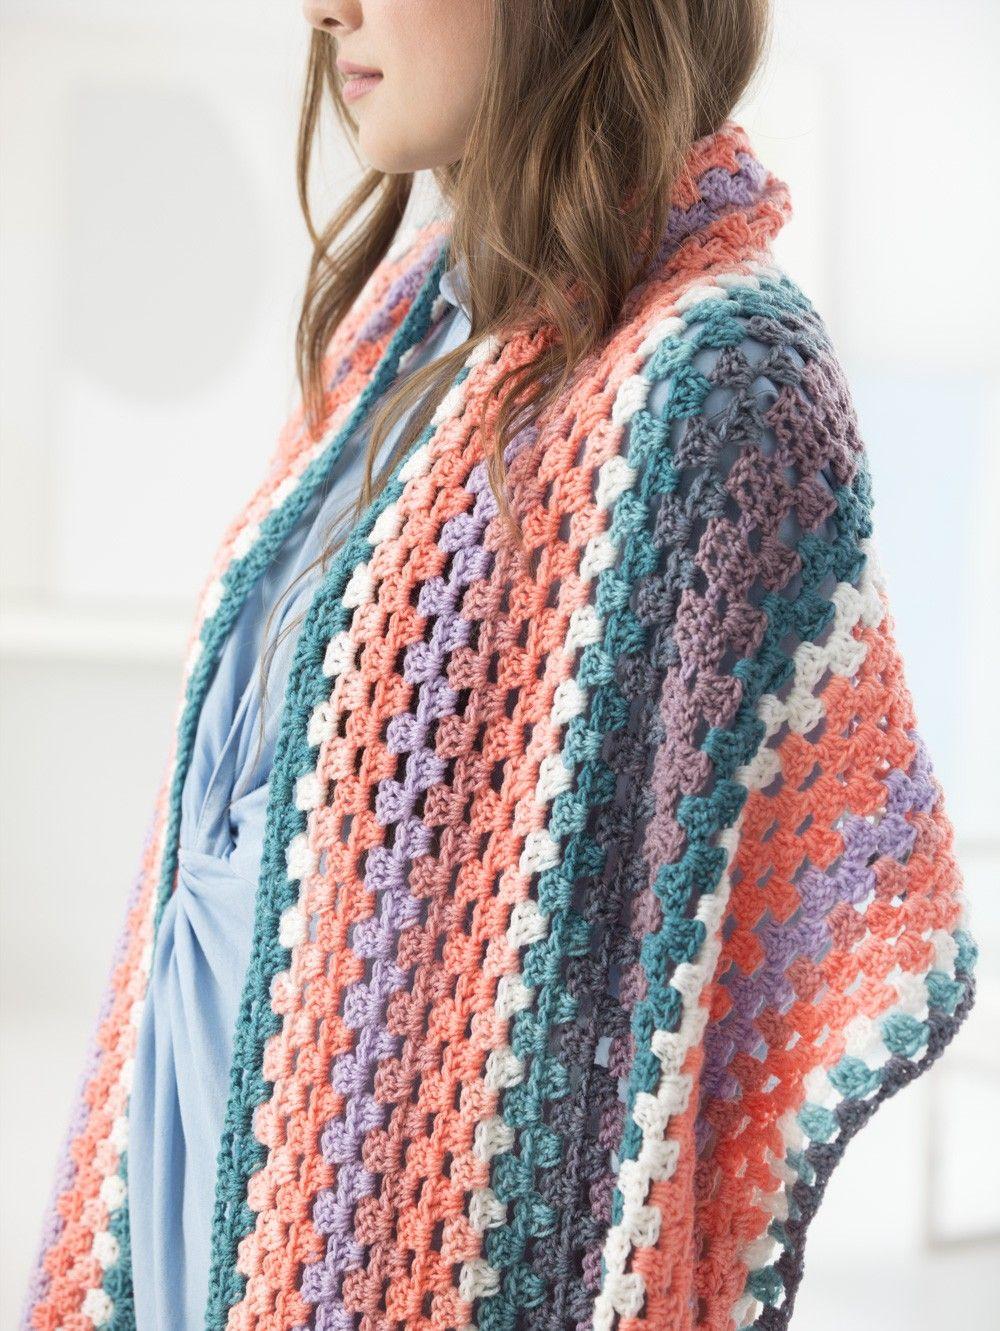 Fringed Shawl (Crochet) *Out of Stock - ETA January 2018 | Crochet ...